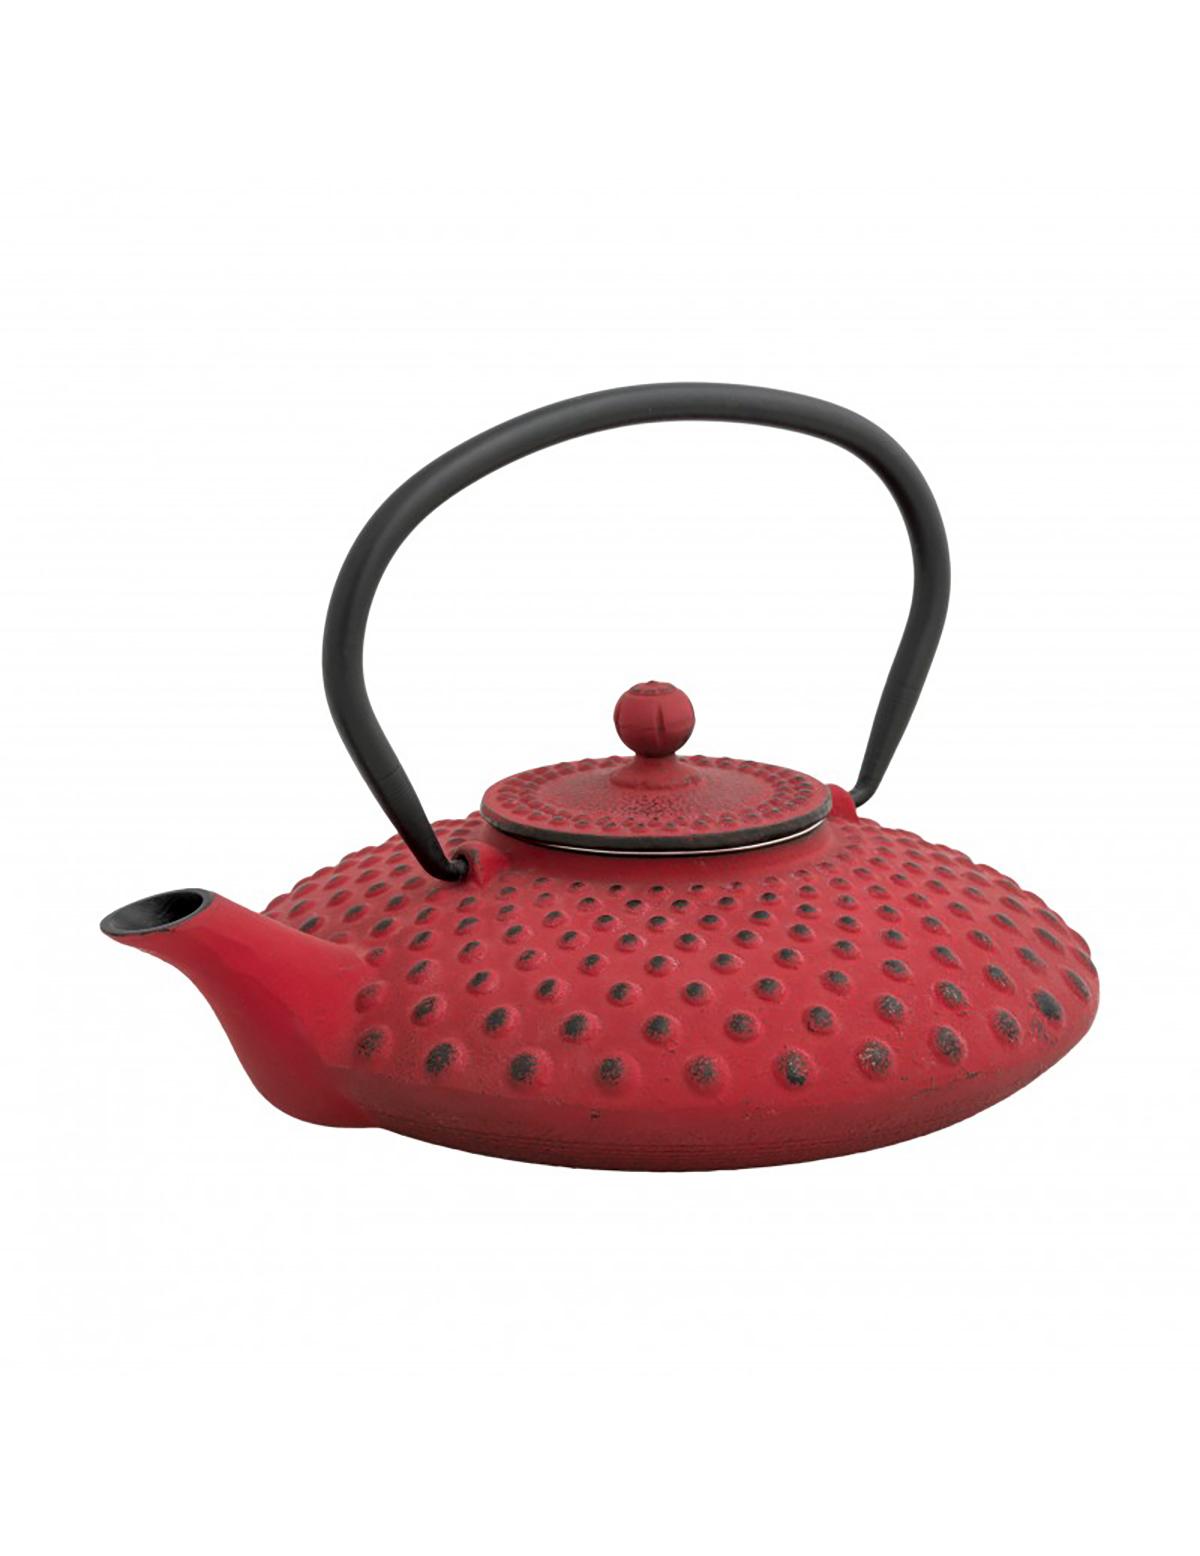 teiera Fragola in ghisa rossa con filtro